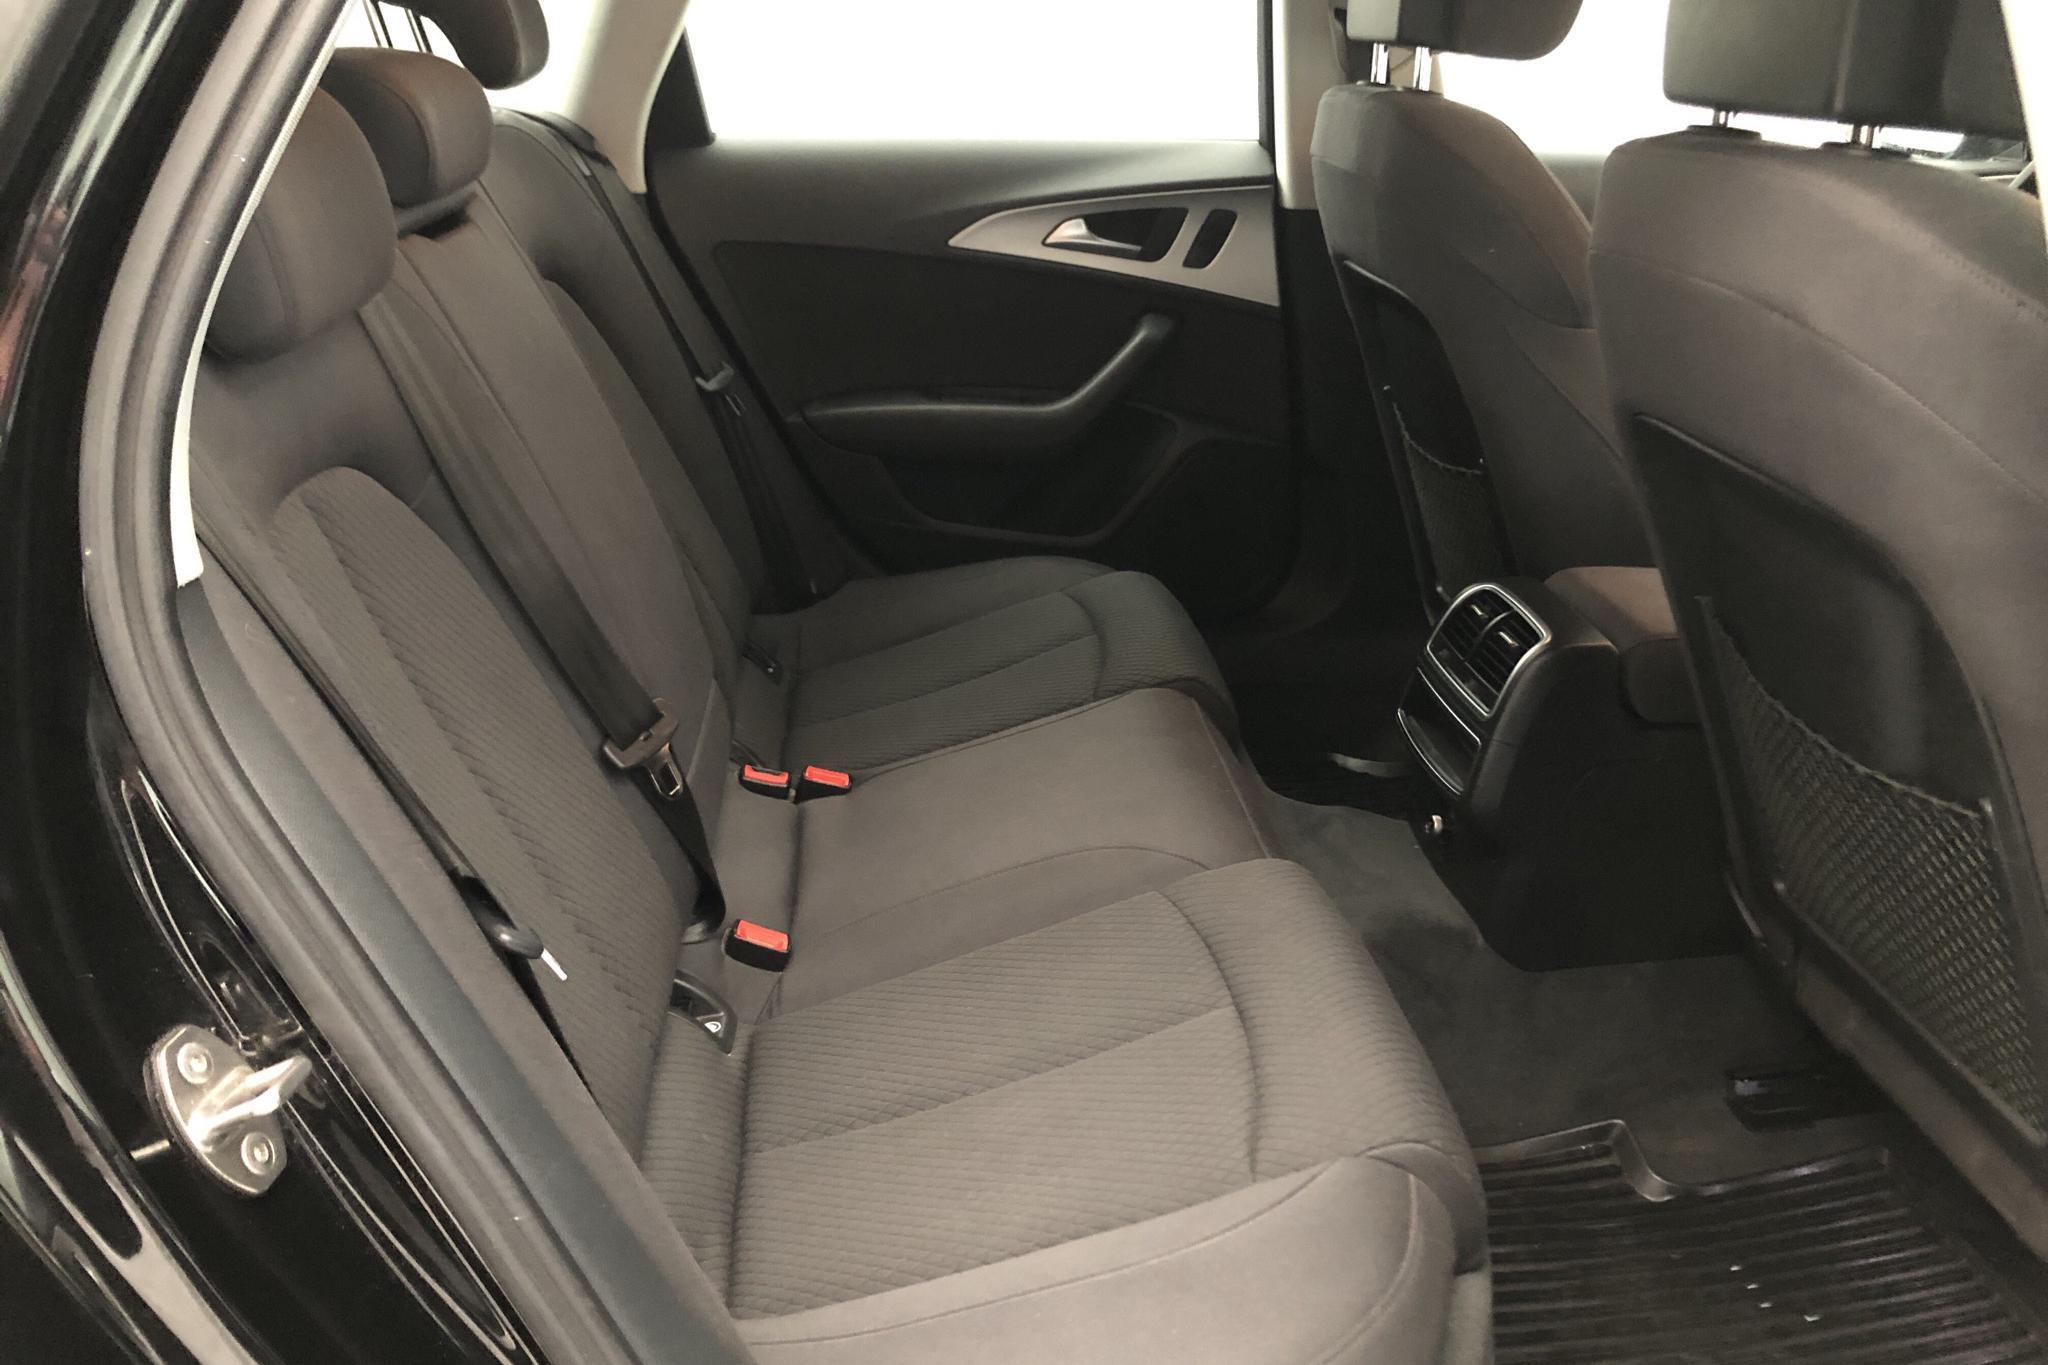 Audi A6 2.0 TDI Avant (177hk) - 177 270 km - Manual - black - 2013